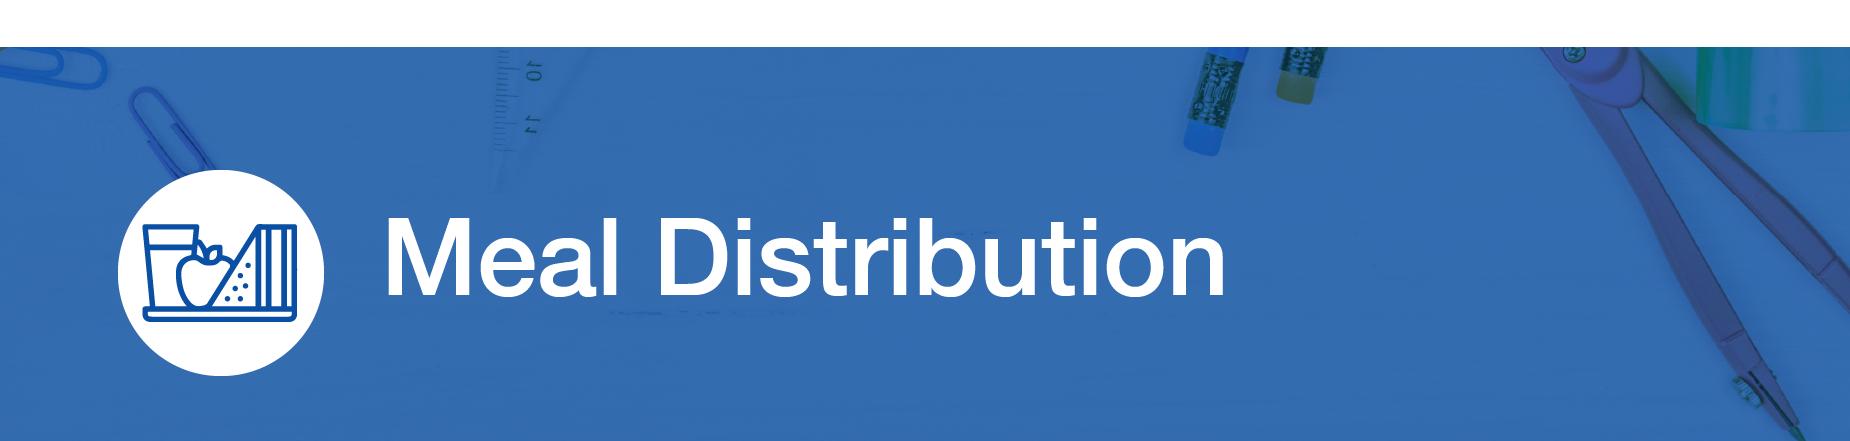 Meal Distribution Banner